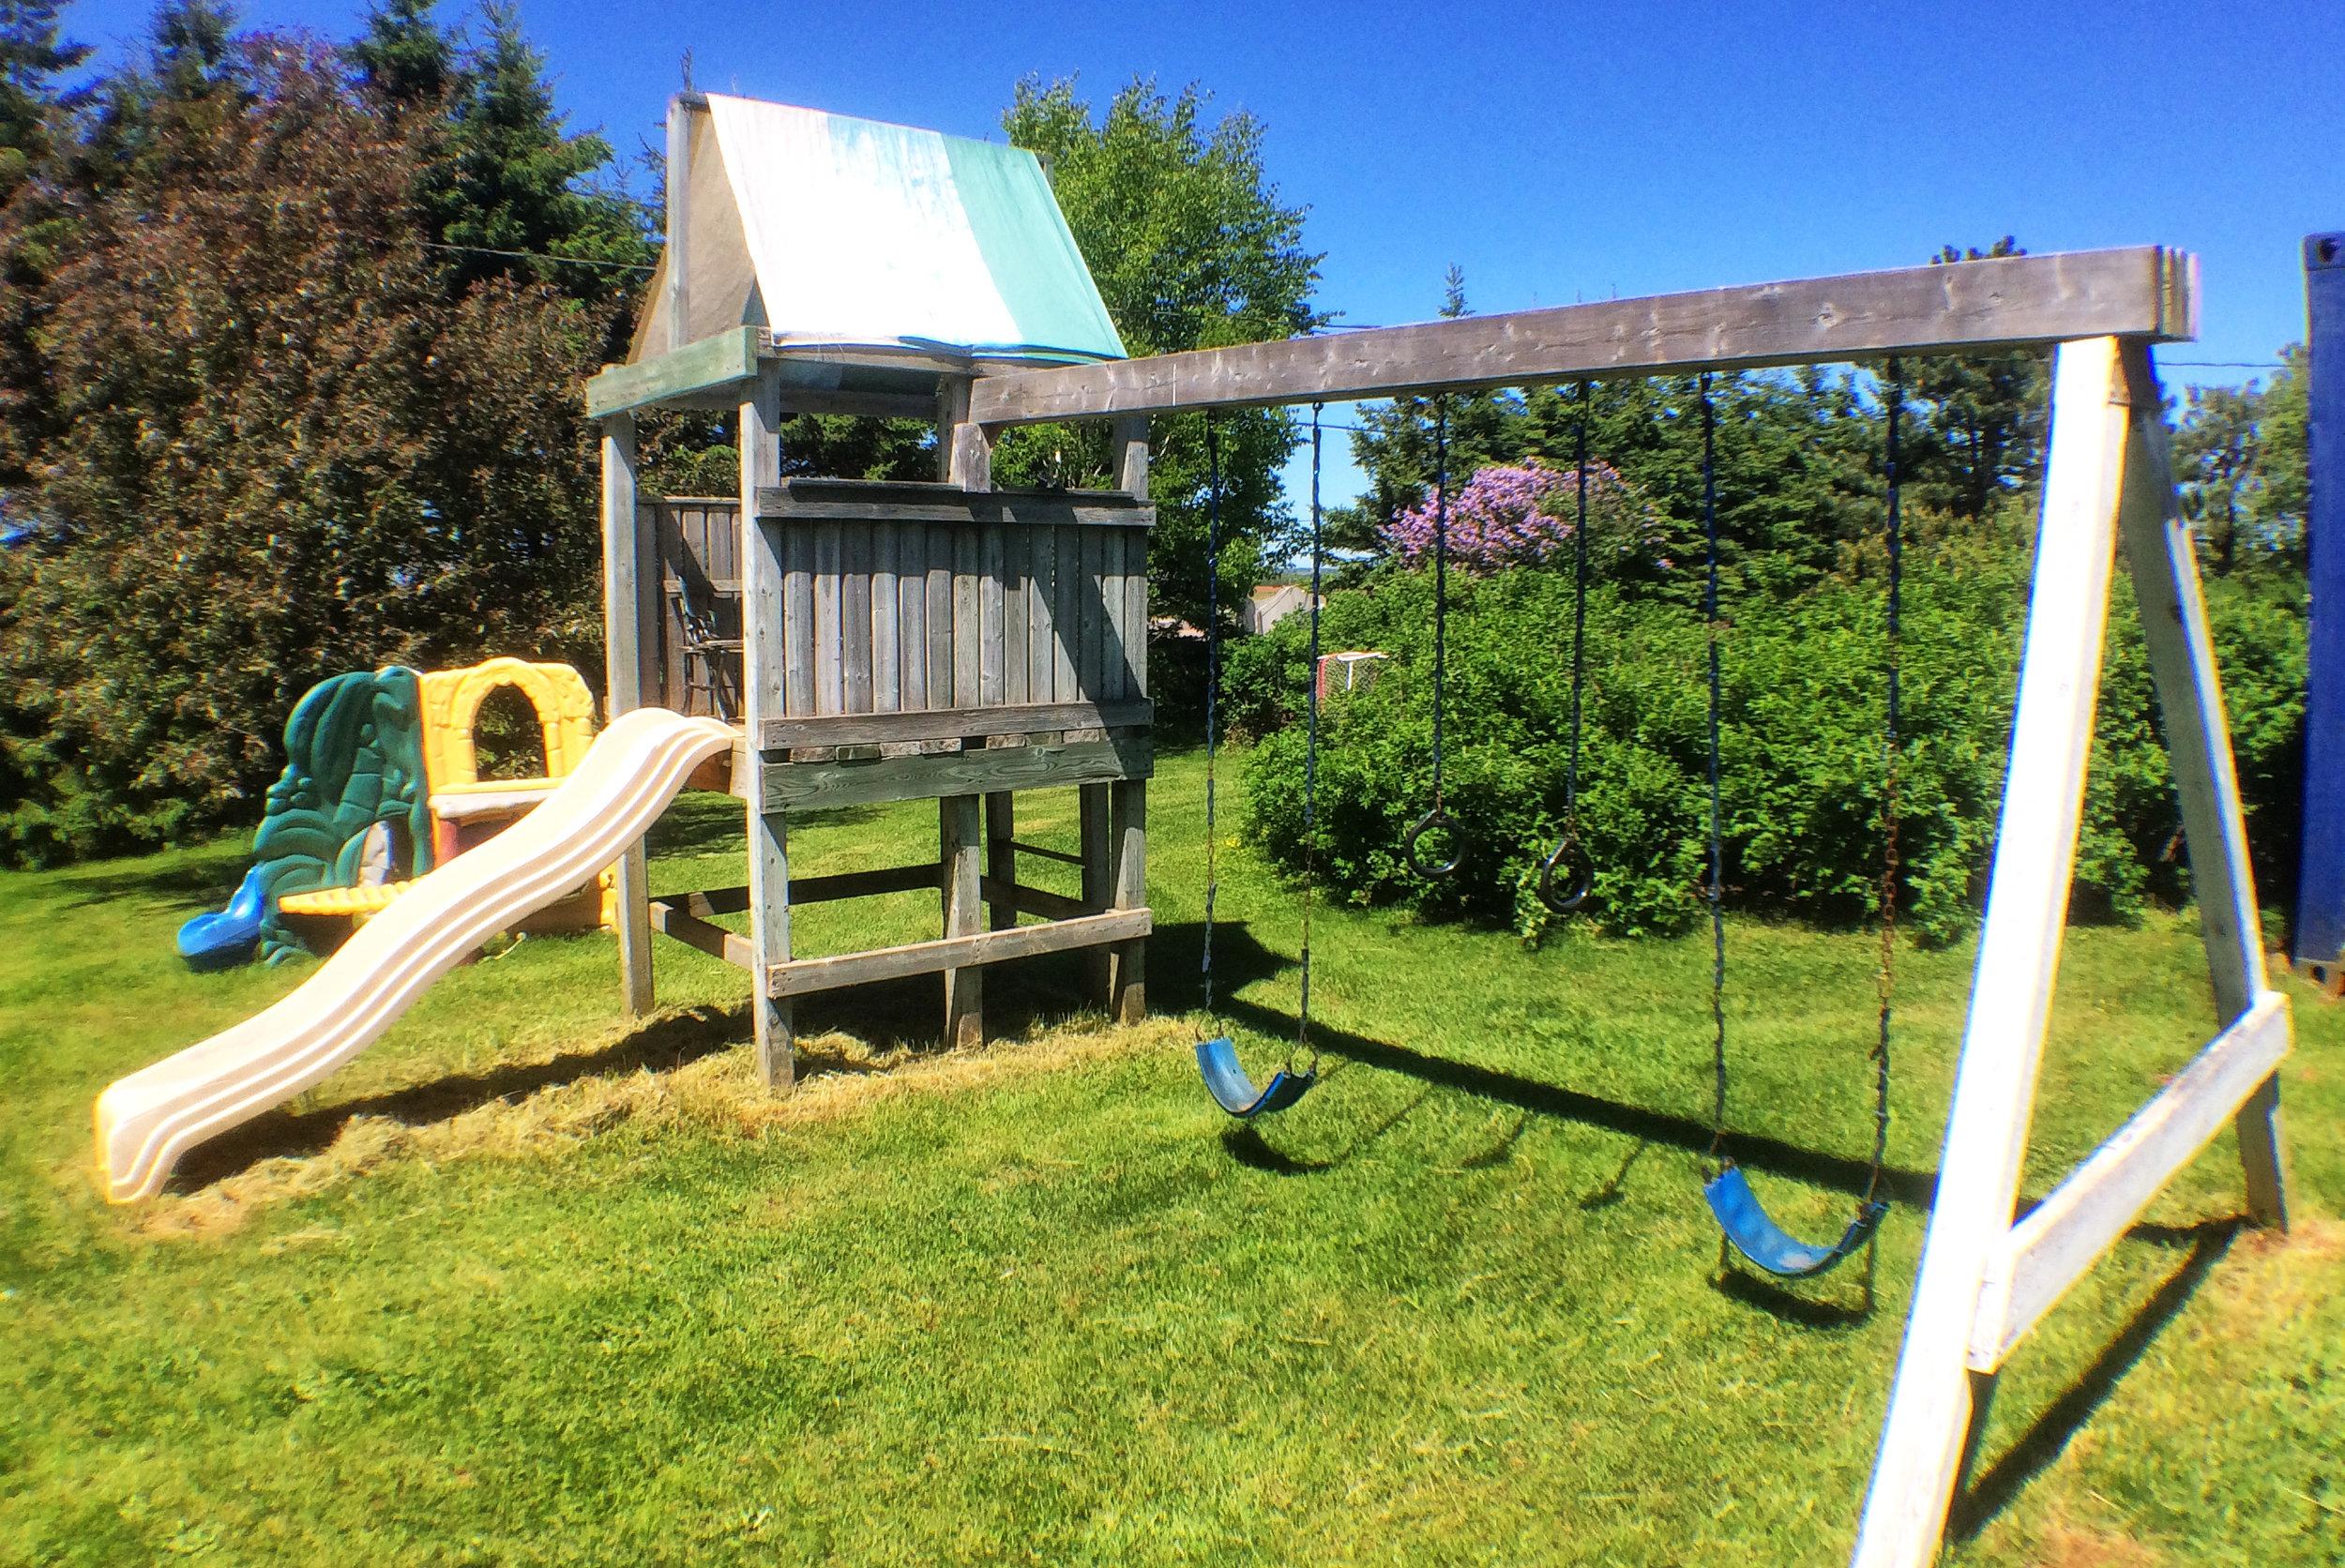 Children's playground with slide and swing set